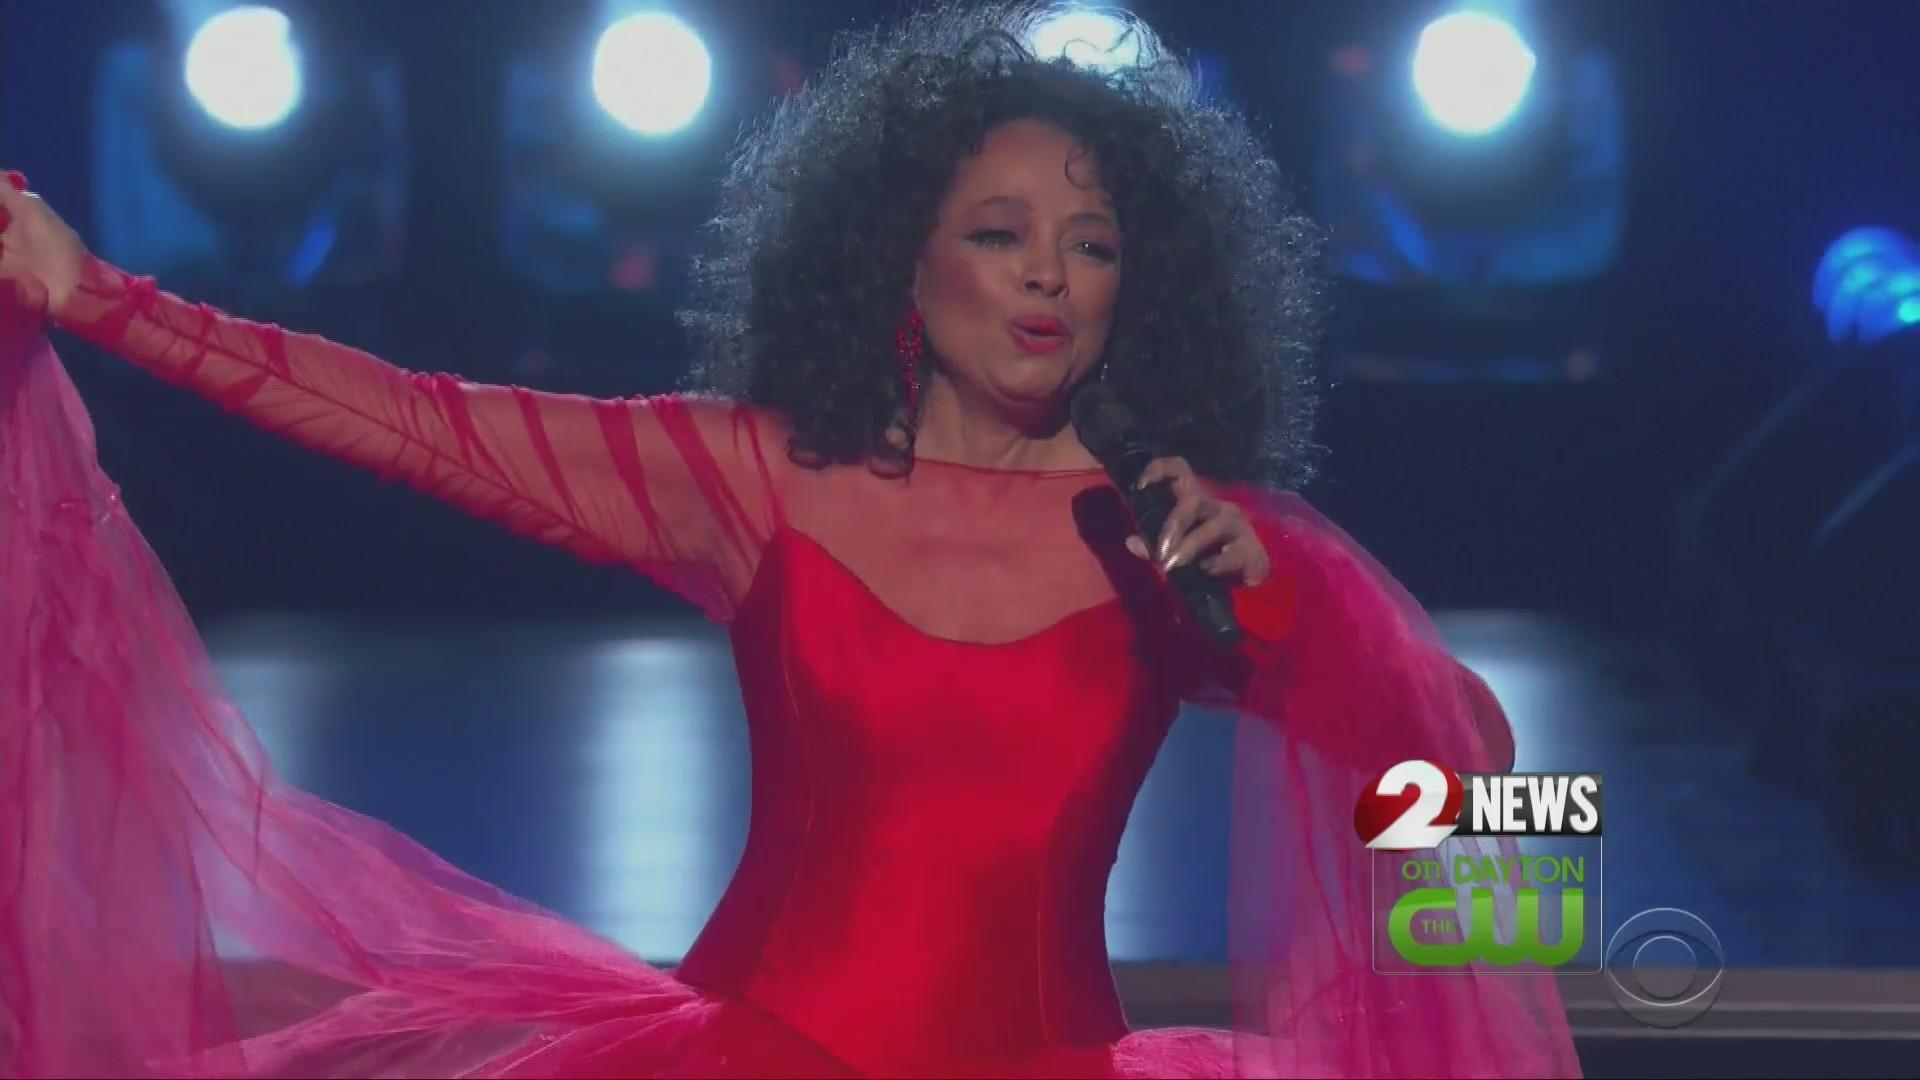 Women, rap artists take center stage at Grammys